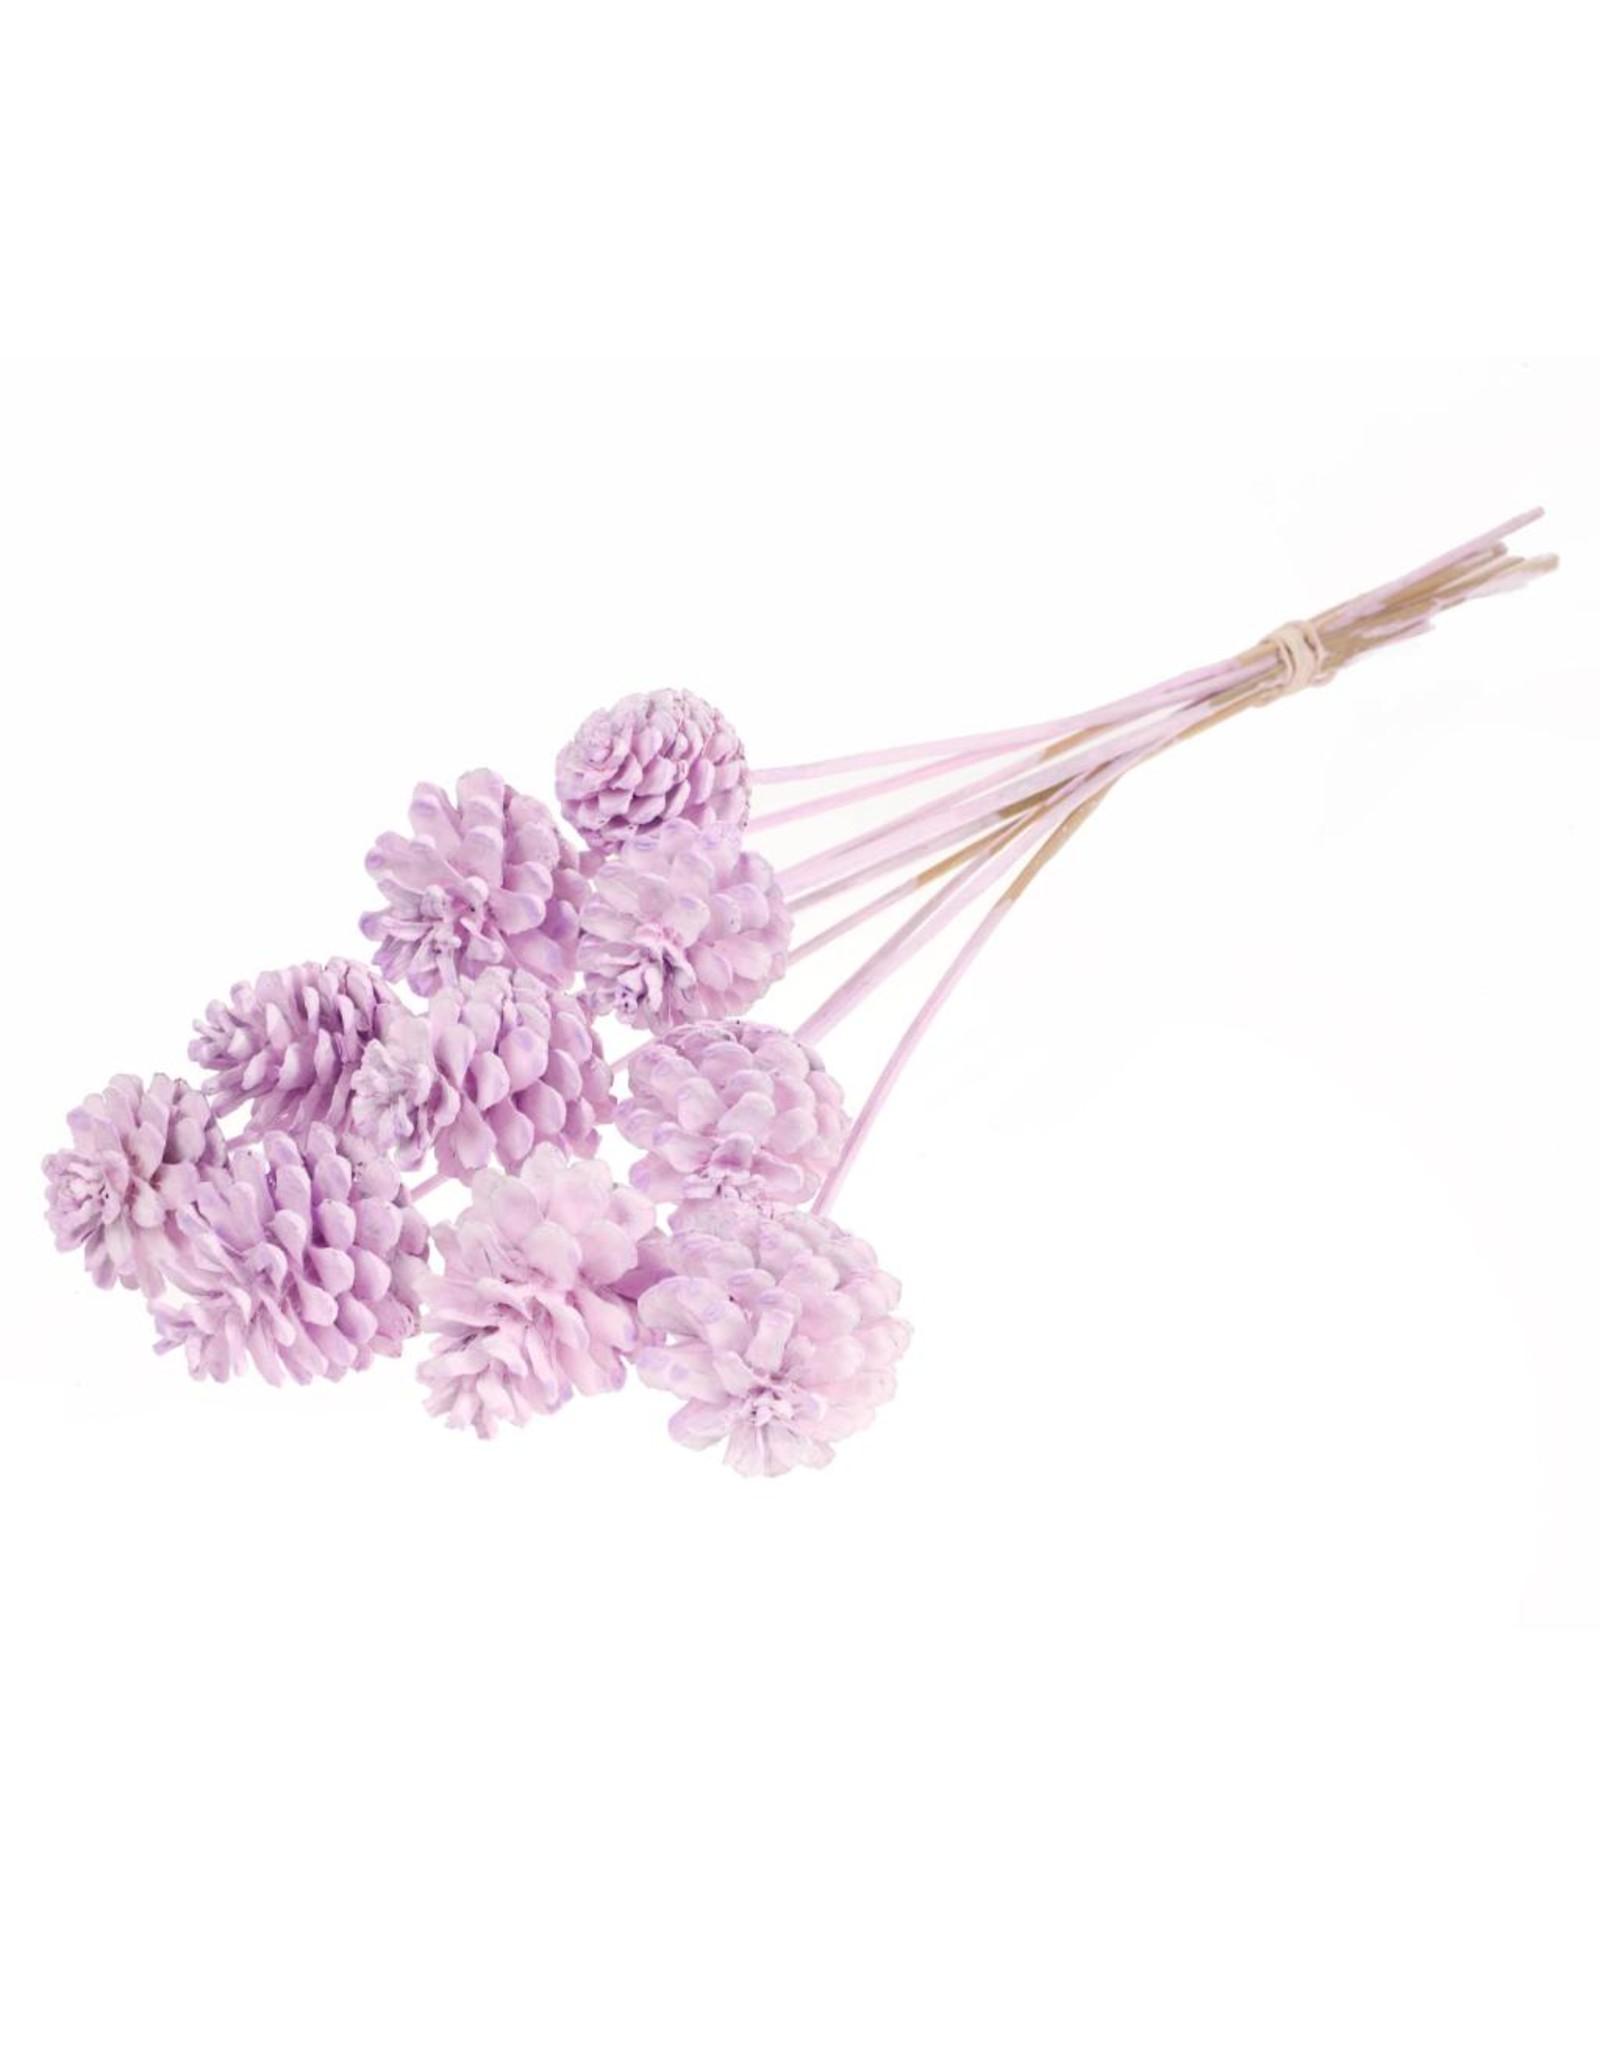 LDD Pine cone 5-7cm o/s lilac misty x 11